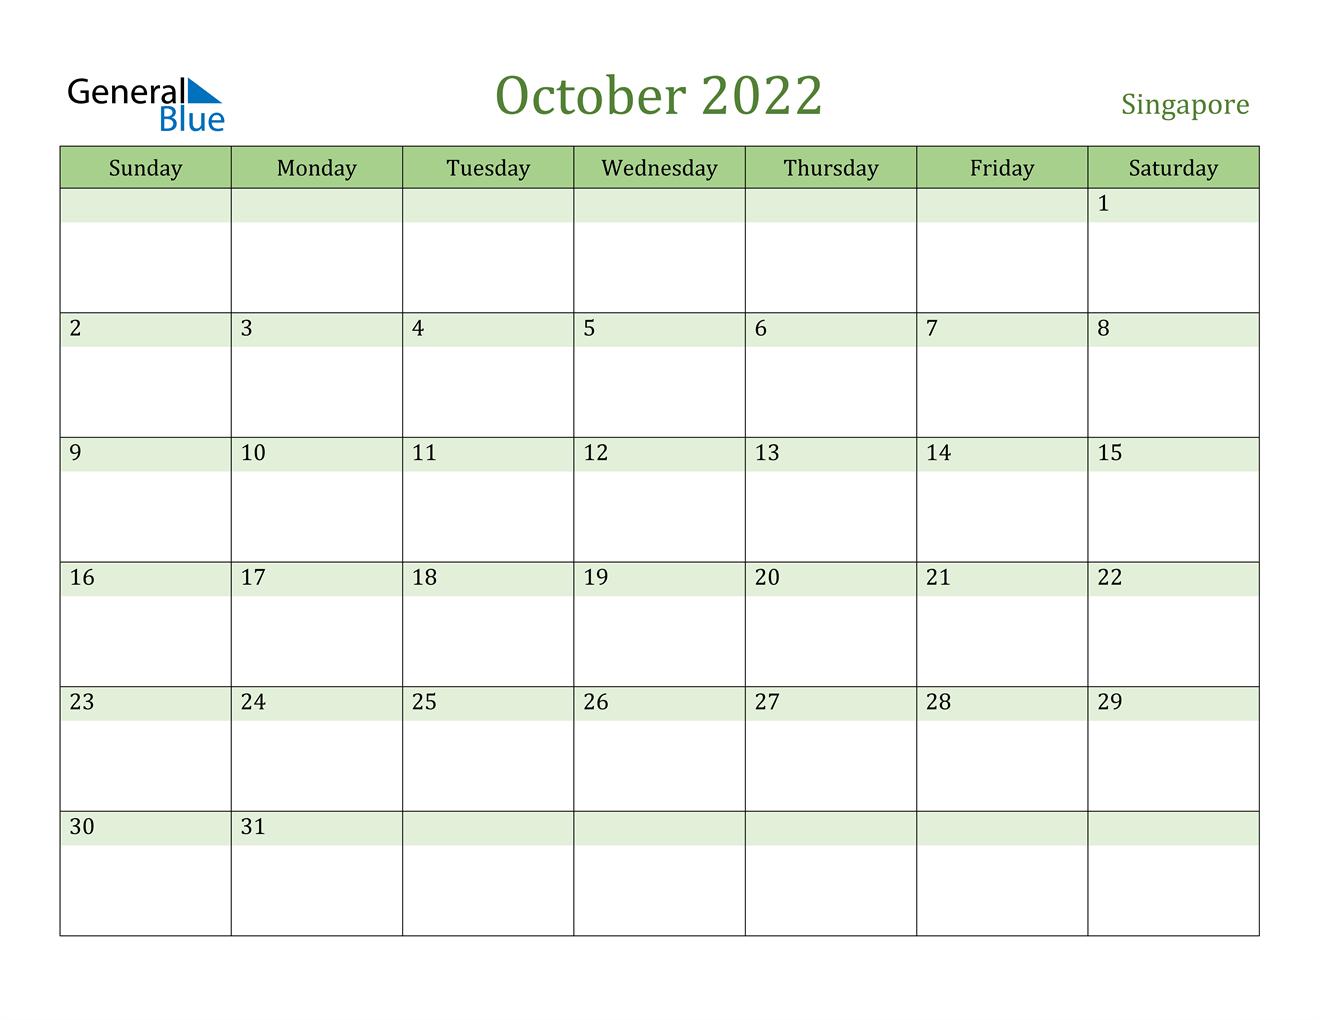 October 2022 Calendar - Singapore